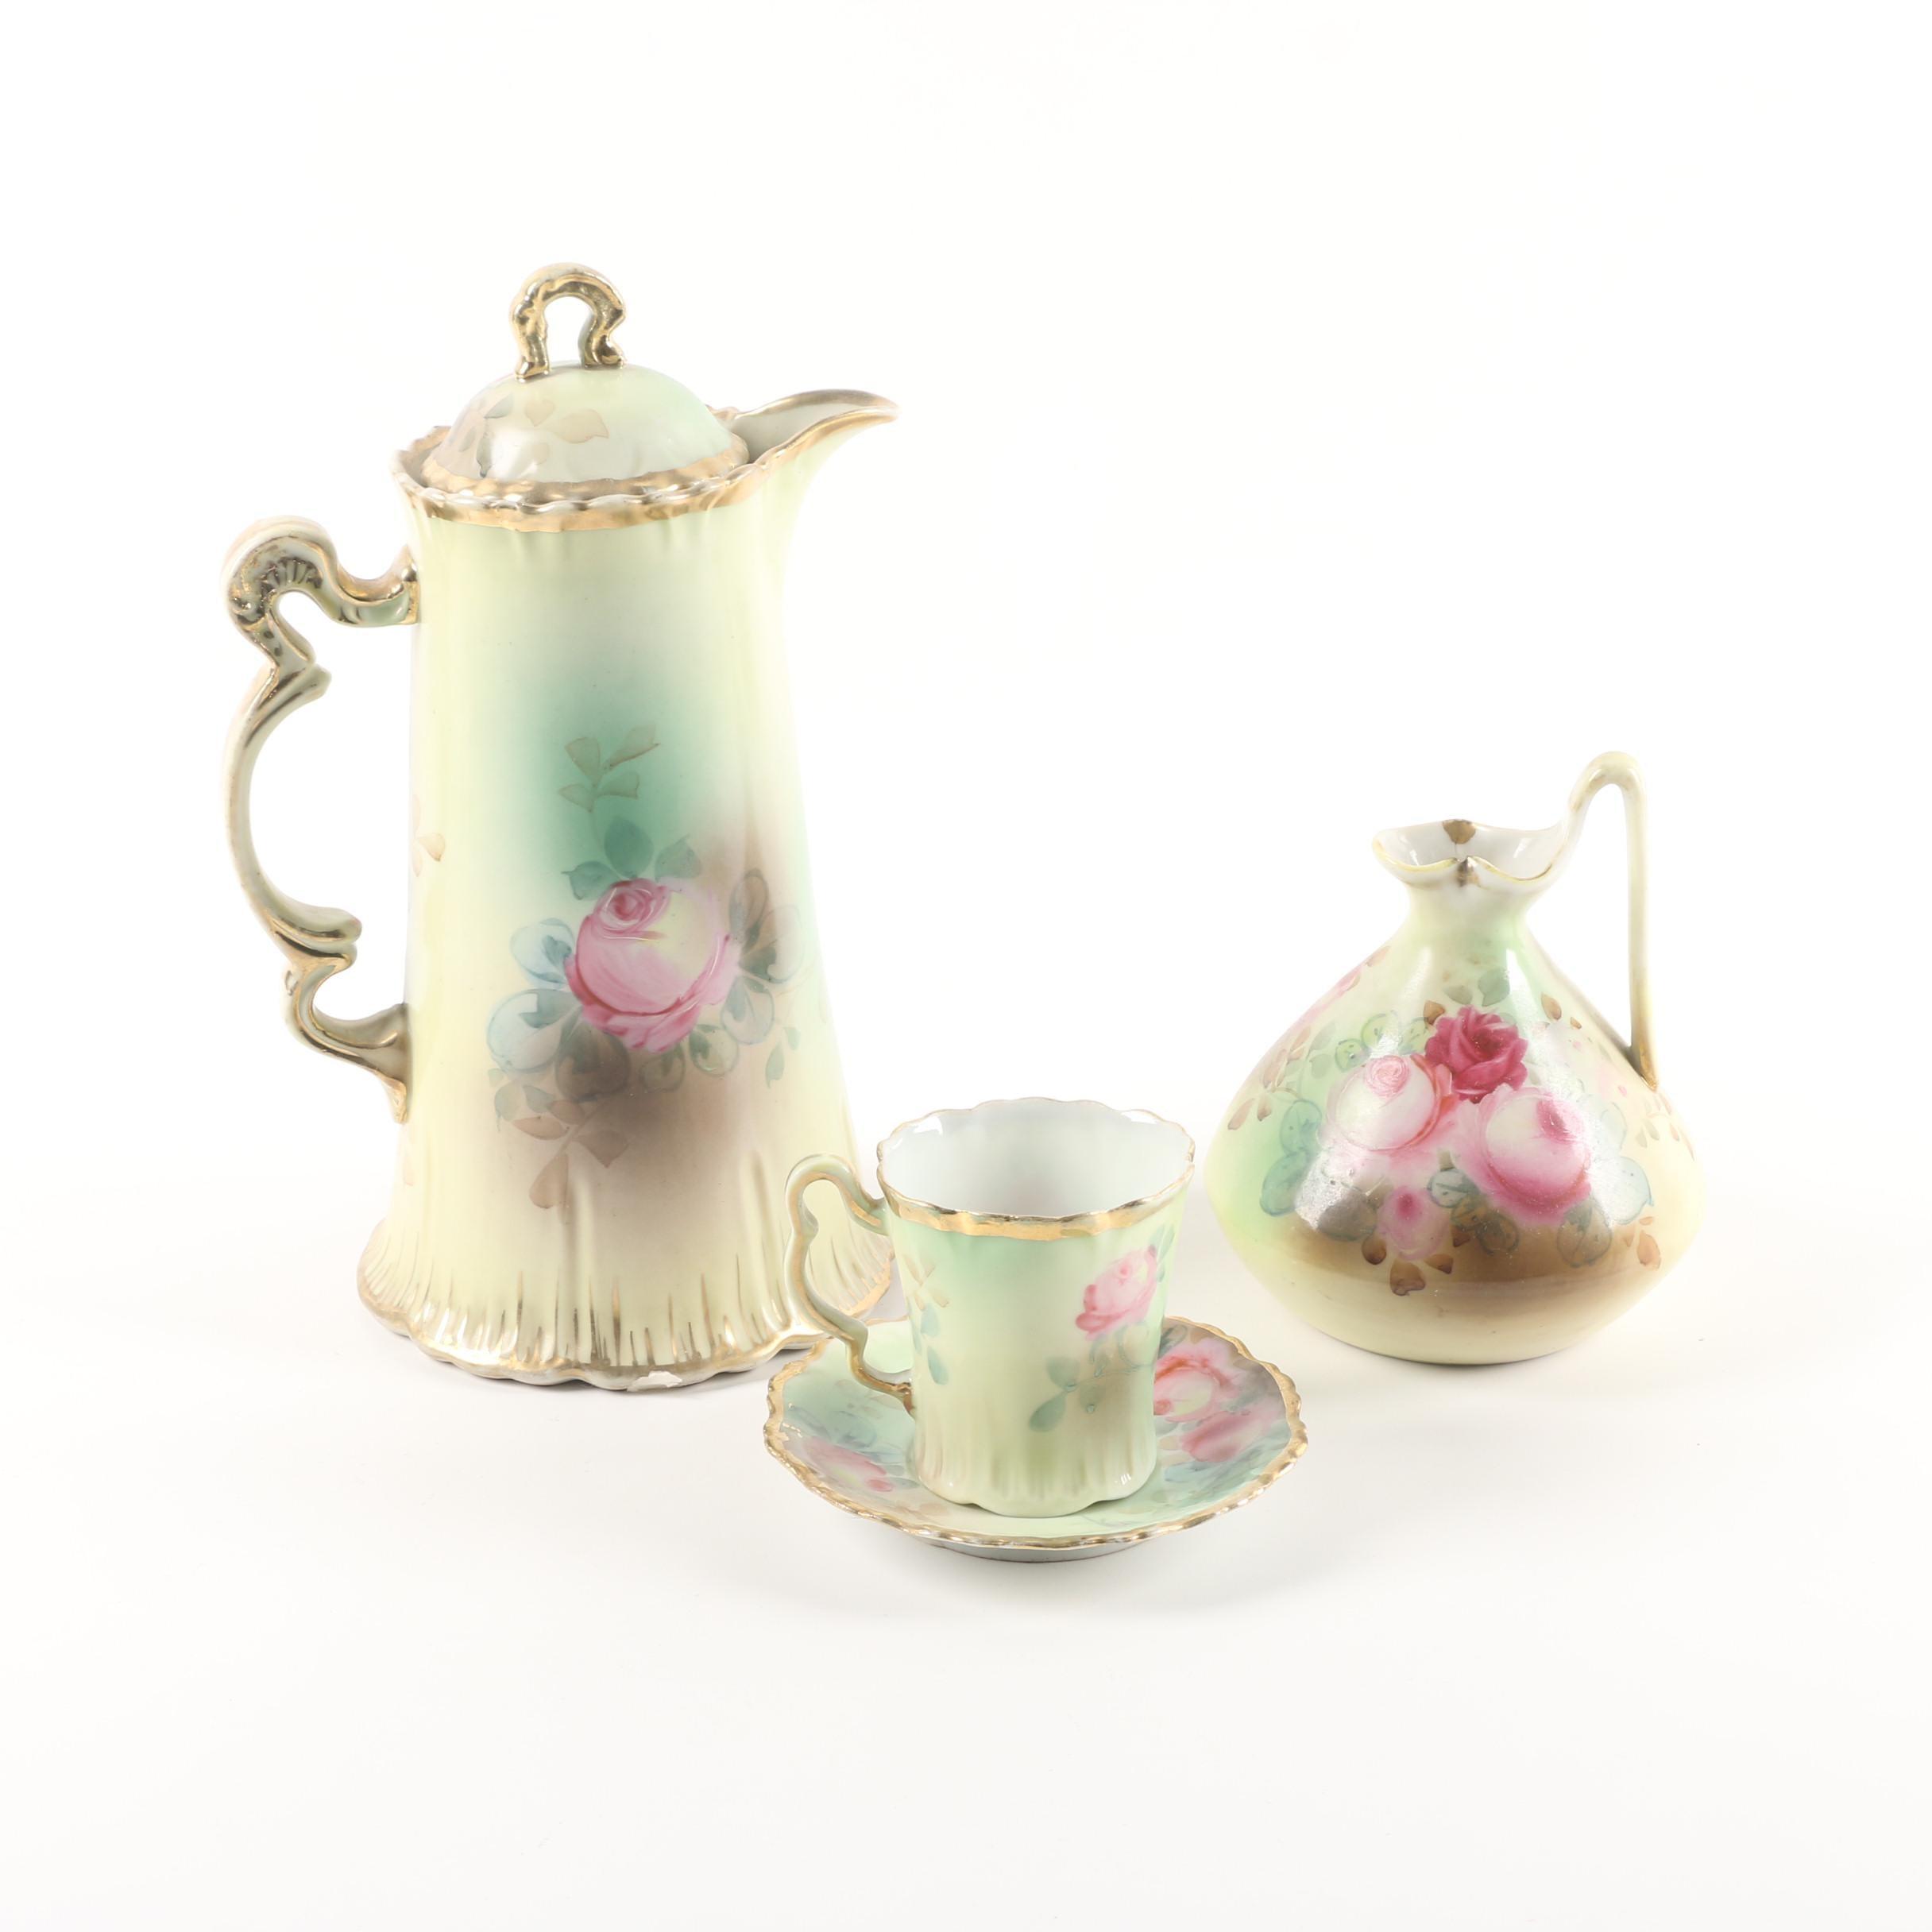 Vintage Hand-Painted Porcelain Serveware ca. 1930s